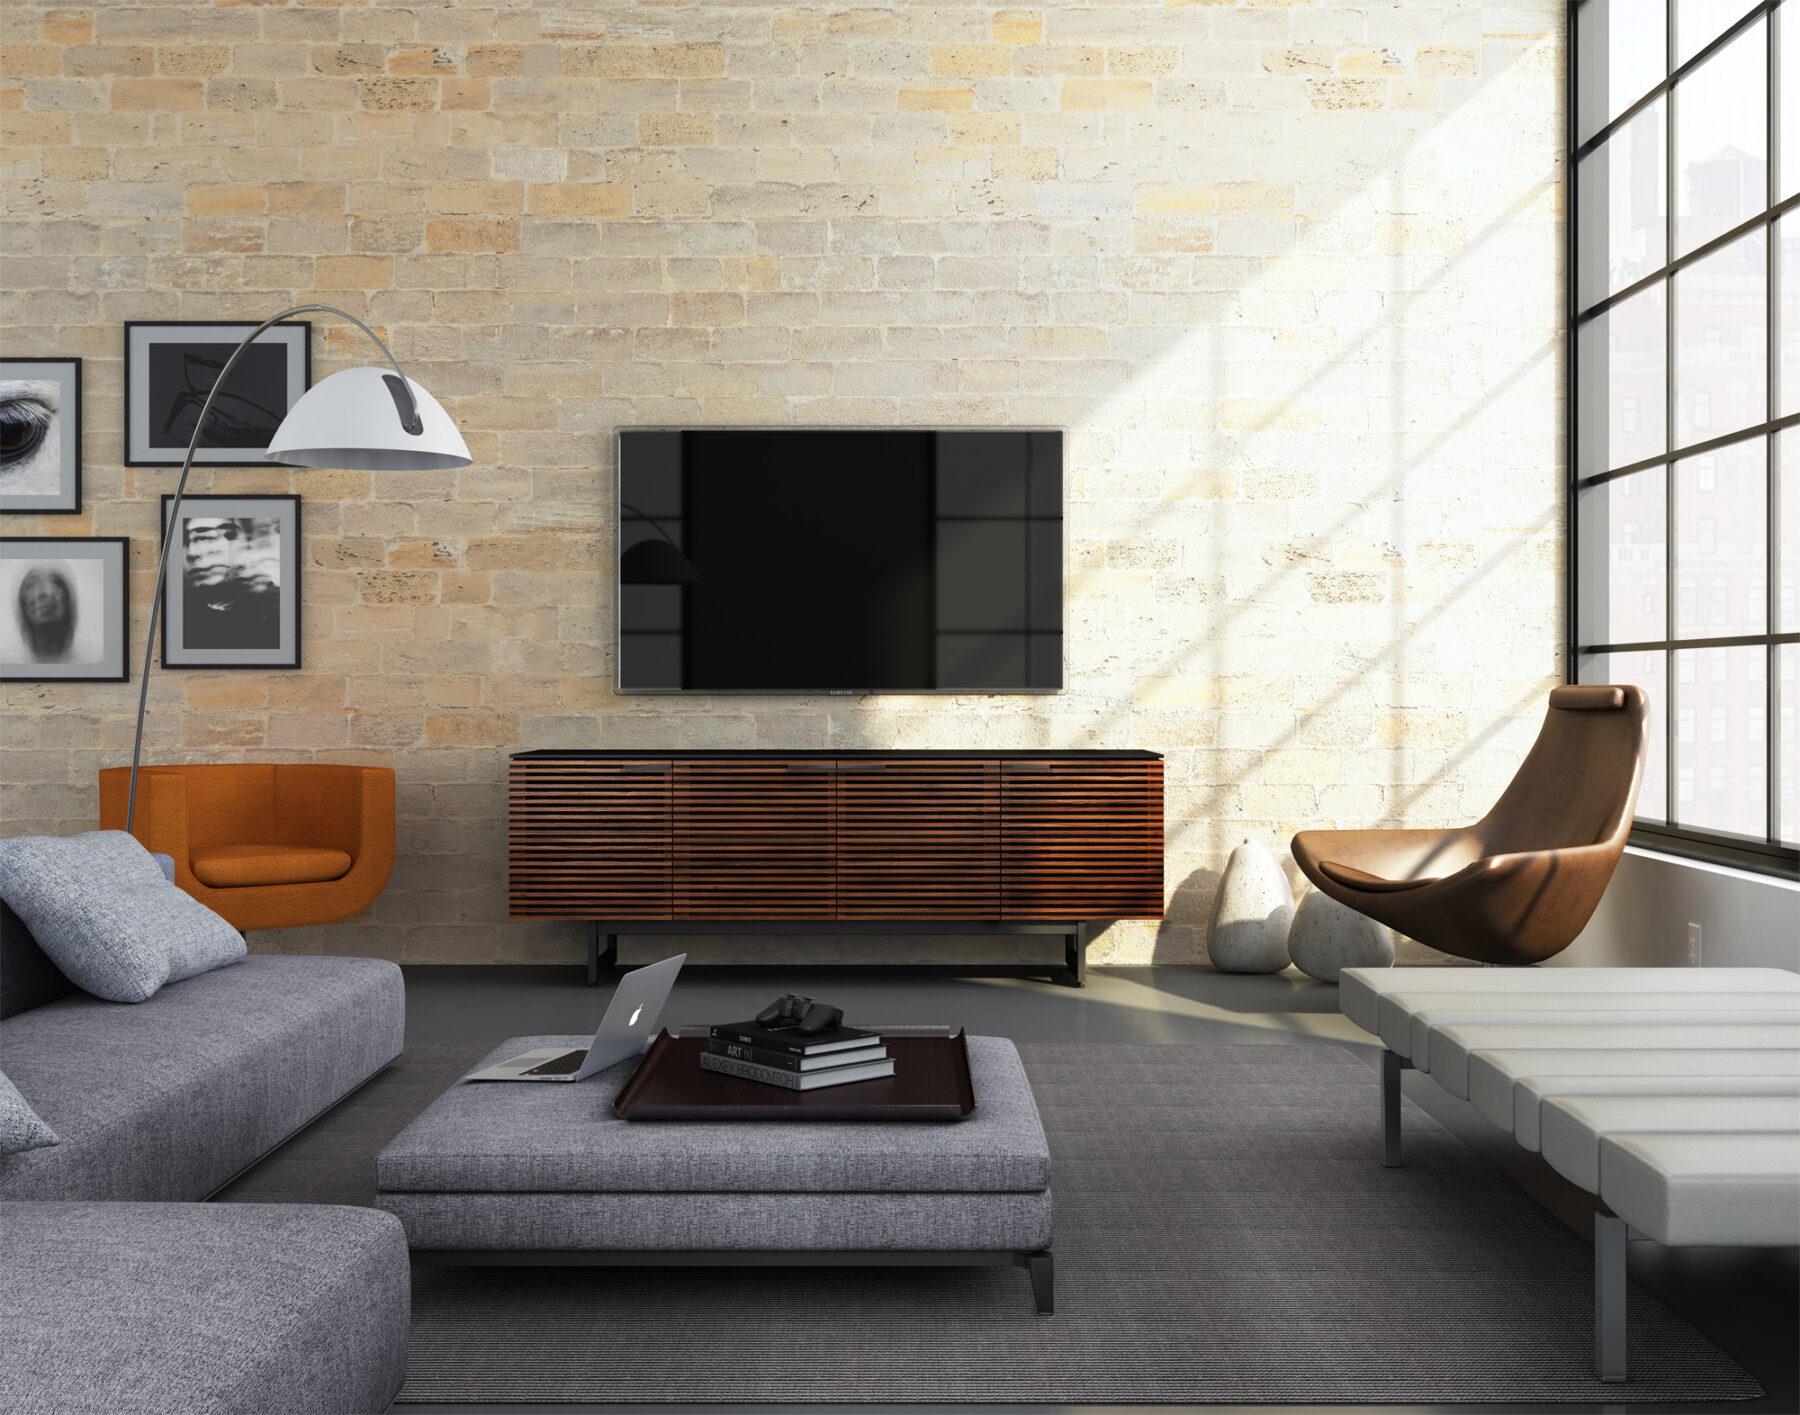 corridor-8179-bdi-chocolate-modern-tv-console-lifestyle-3